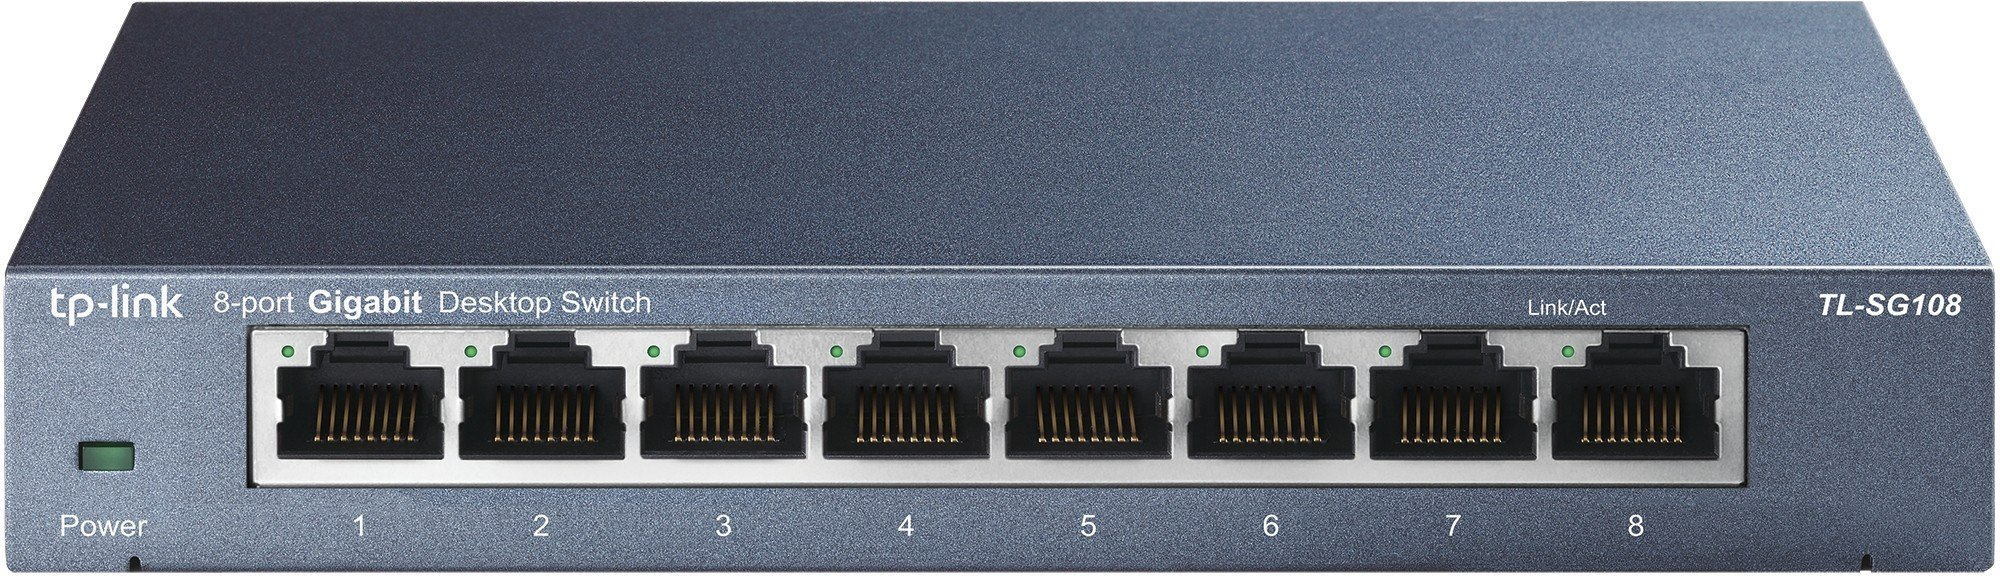 TP-Link 8 Port Gigabit Ethernet Network Switch | Ethernet Splitter | Sturdy Metal w/Shielded Ports |Plug-and-Play | Traffic Optimization | Unmanaged (TL-SG108)